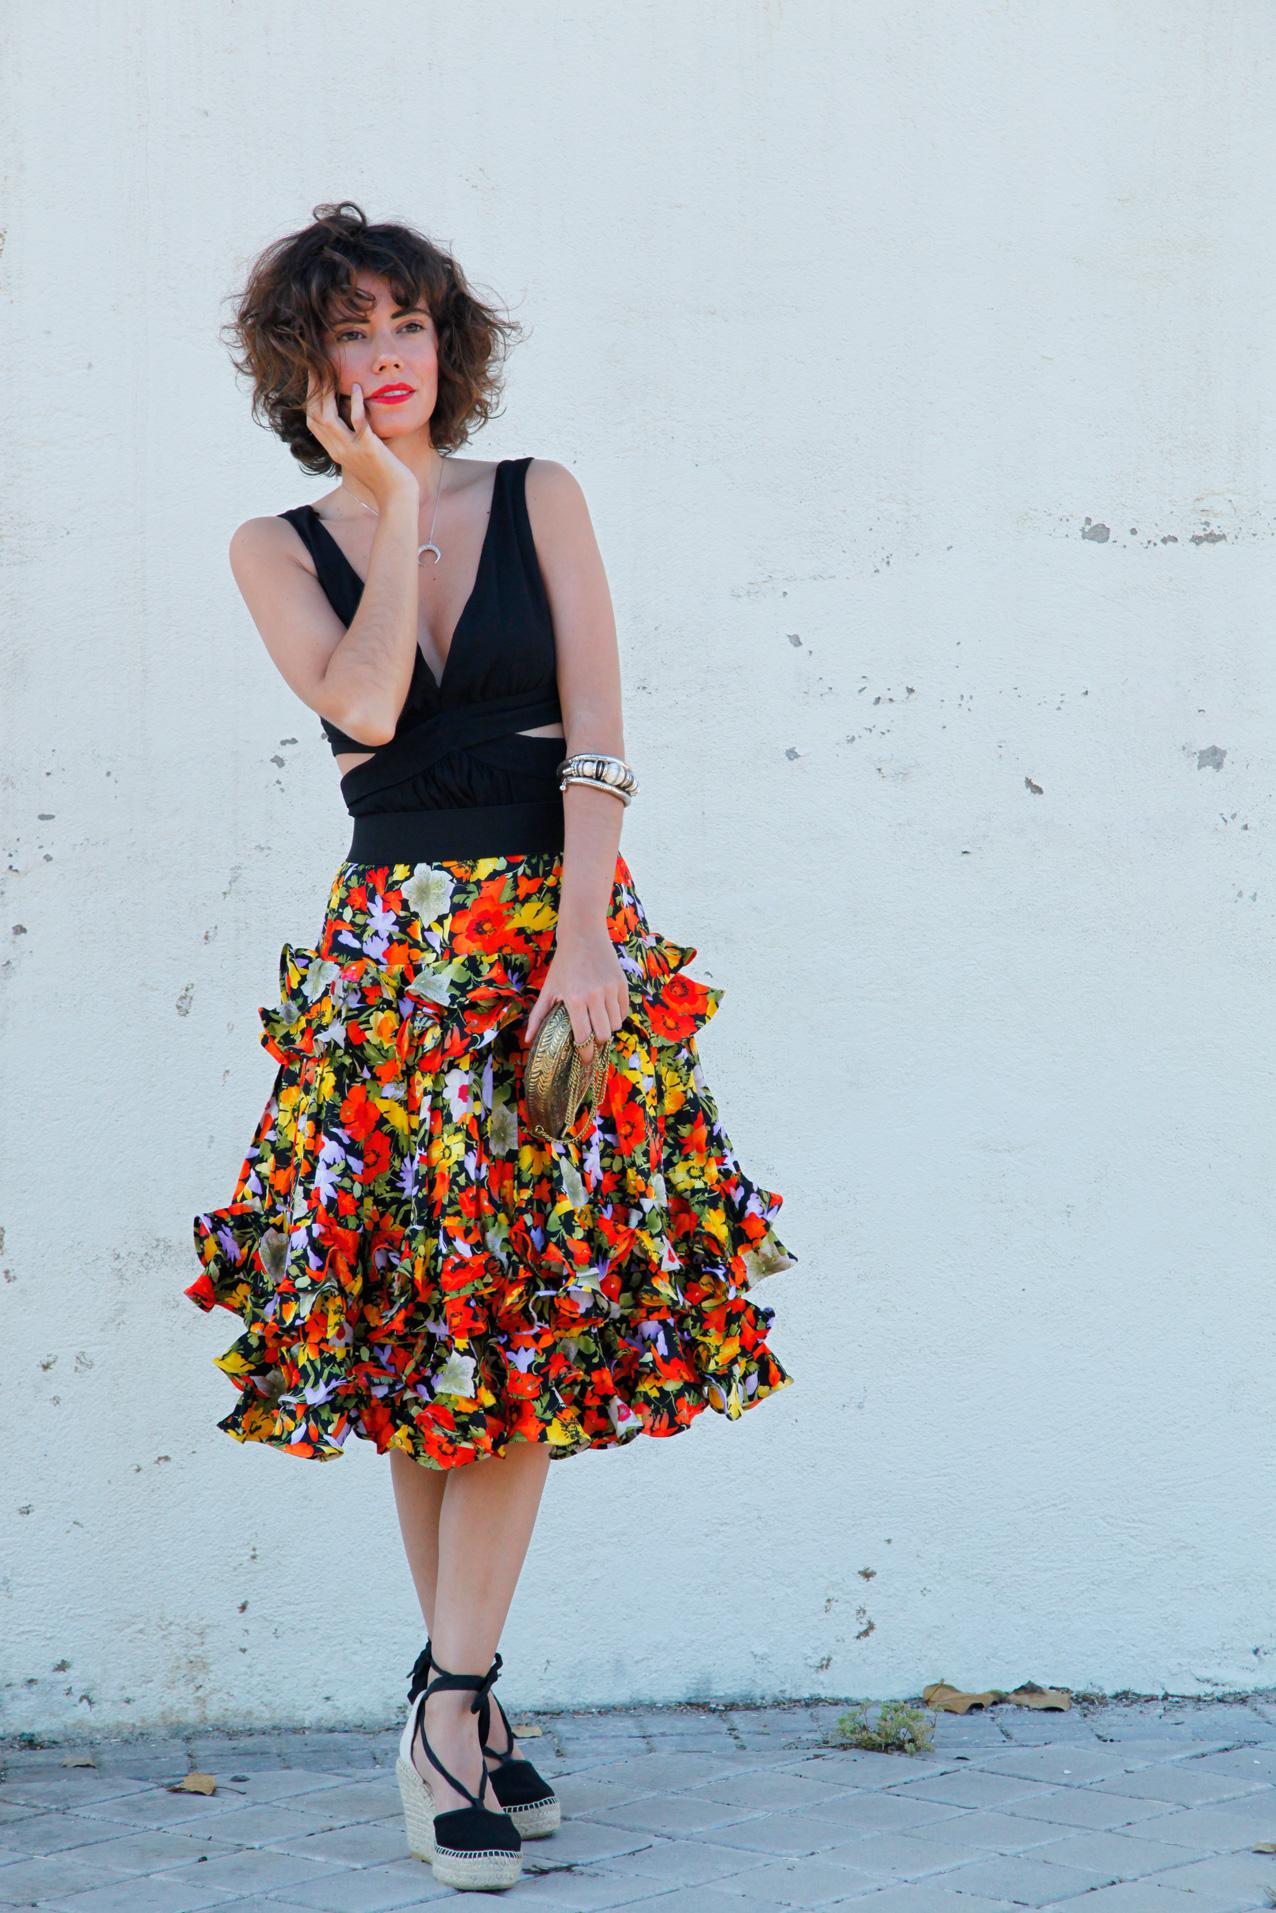 west_side_my_story_floral_vintage_skrit_streetstyle_cool_lemonade